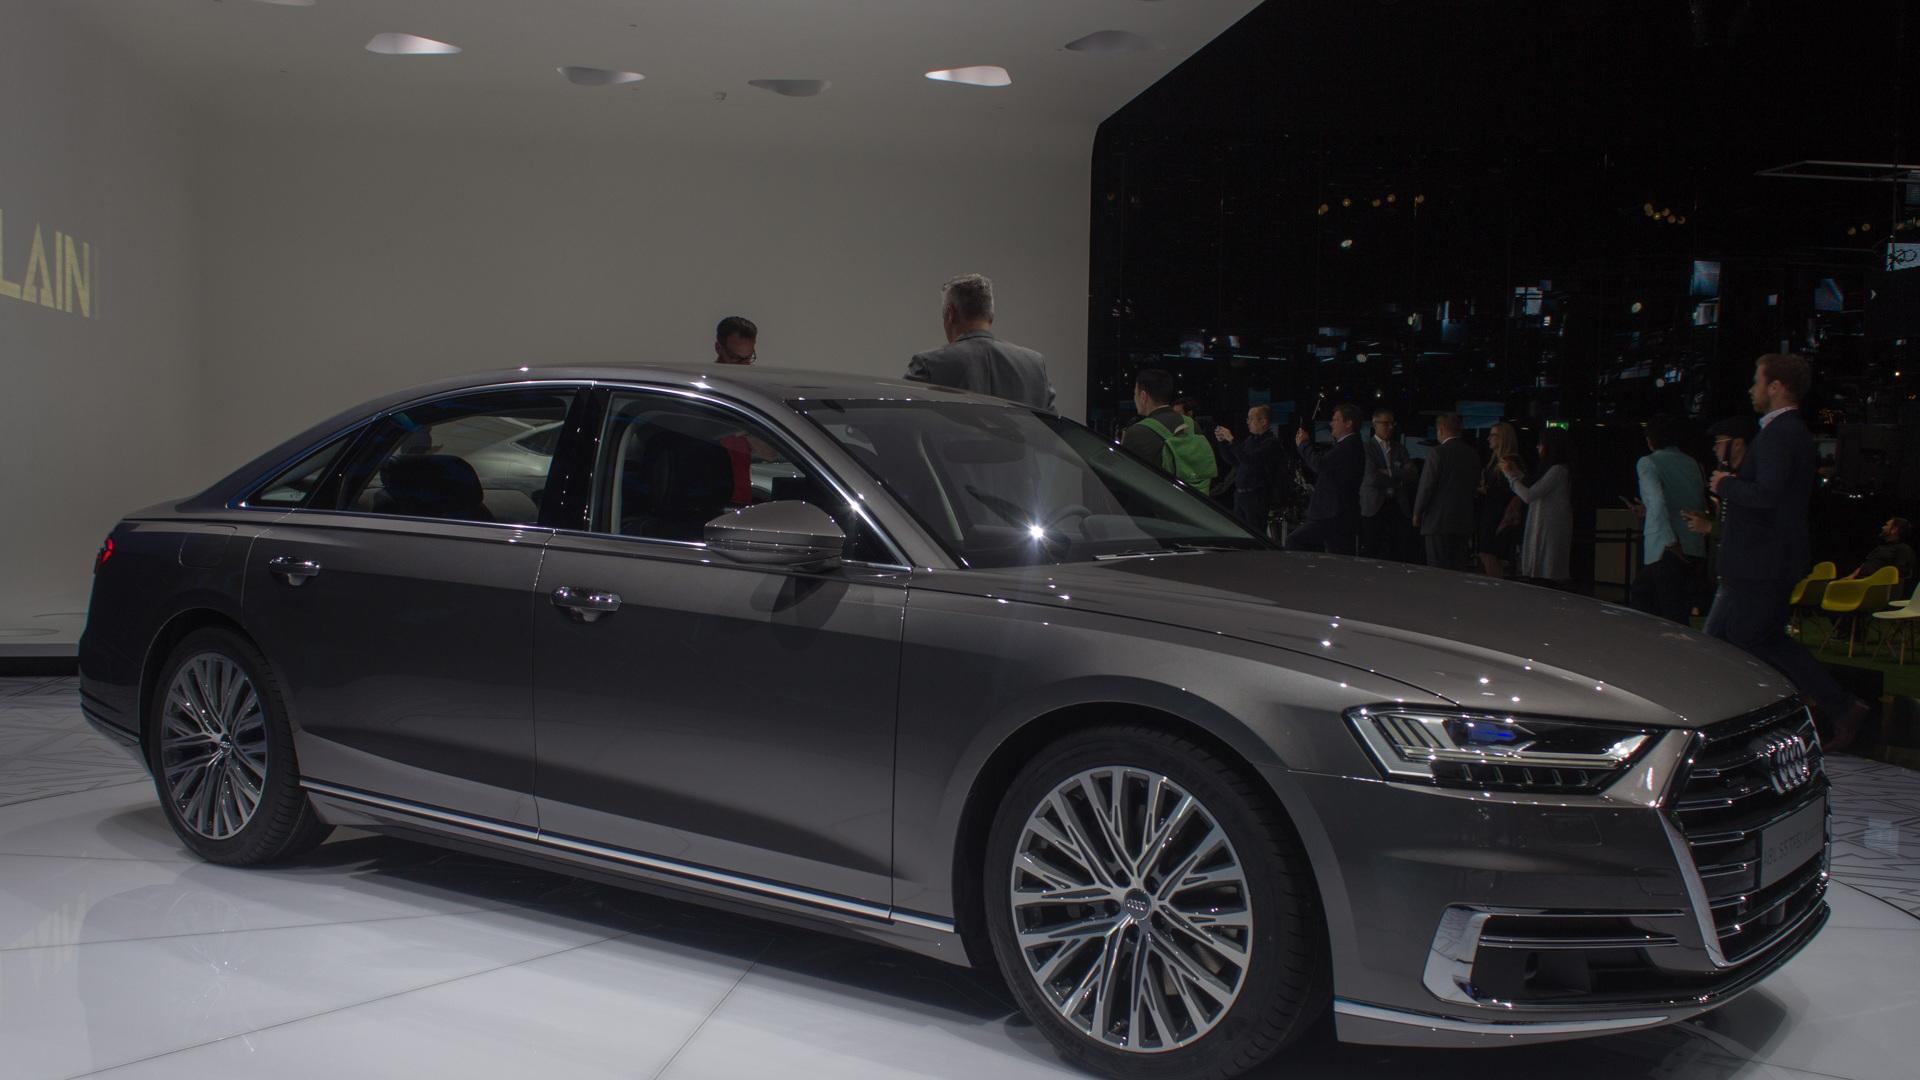 2019 Audi A8, 2017 Frankfurt auto show